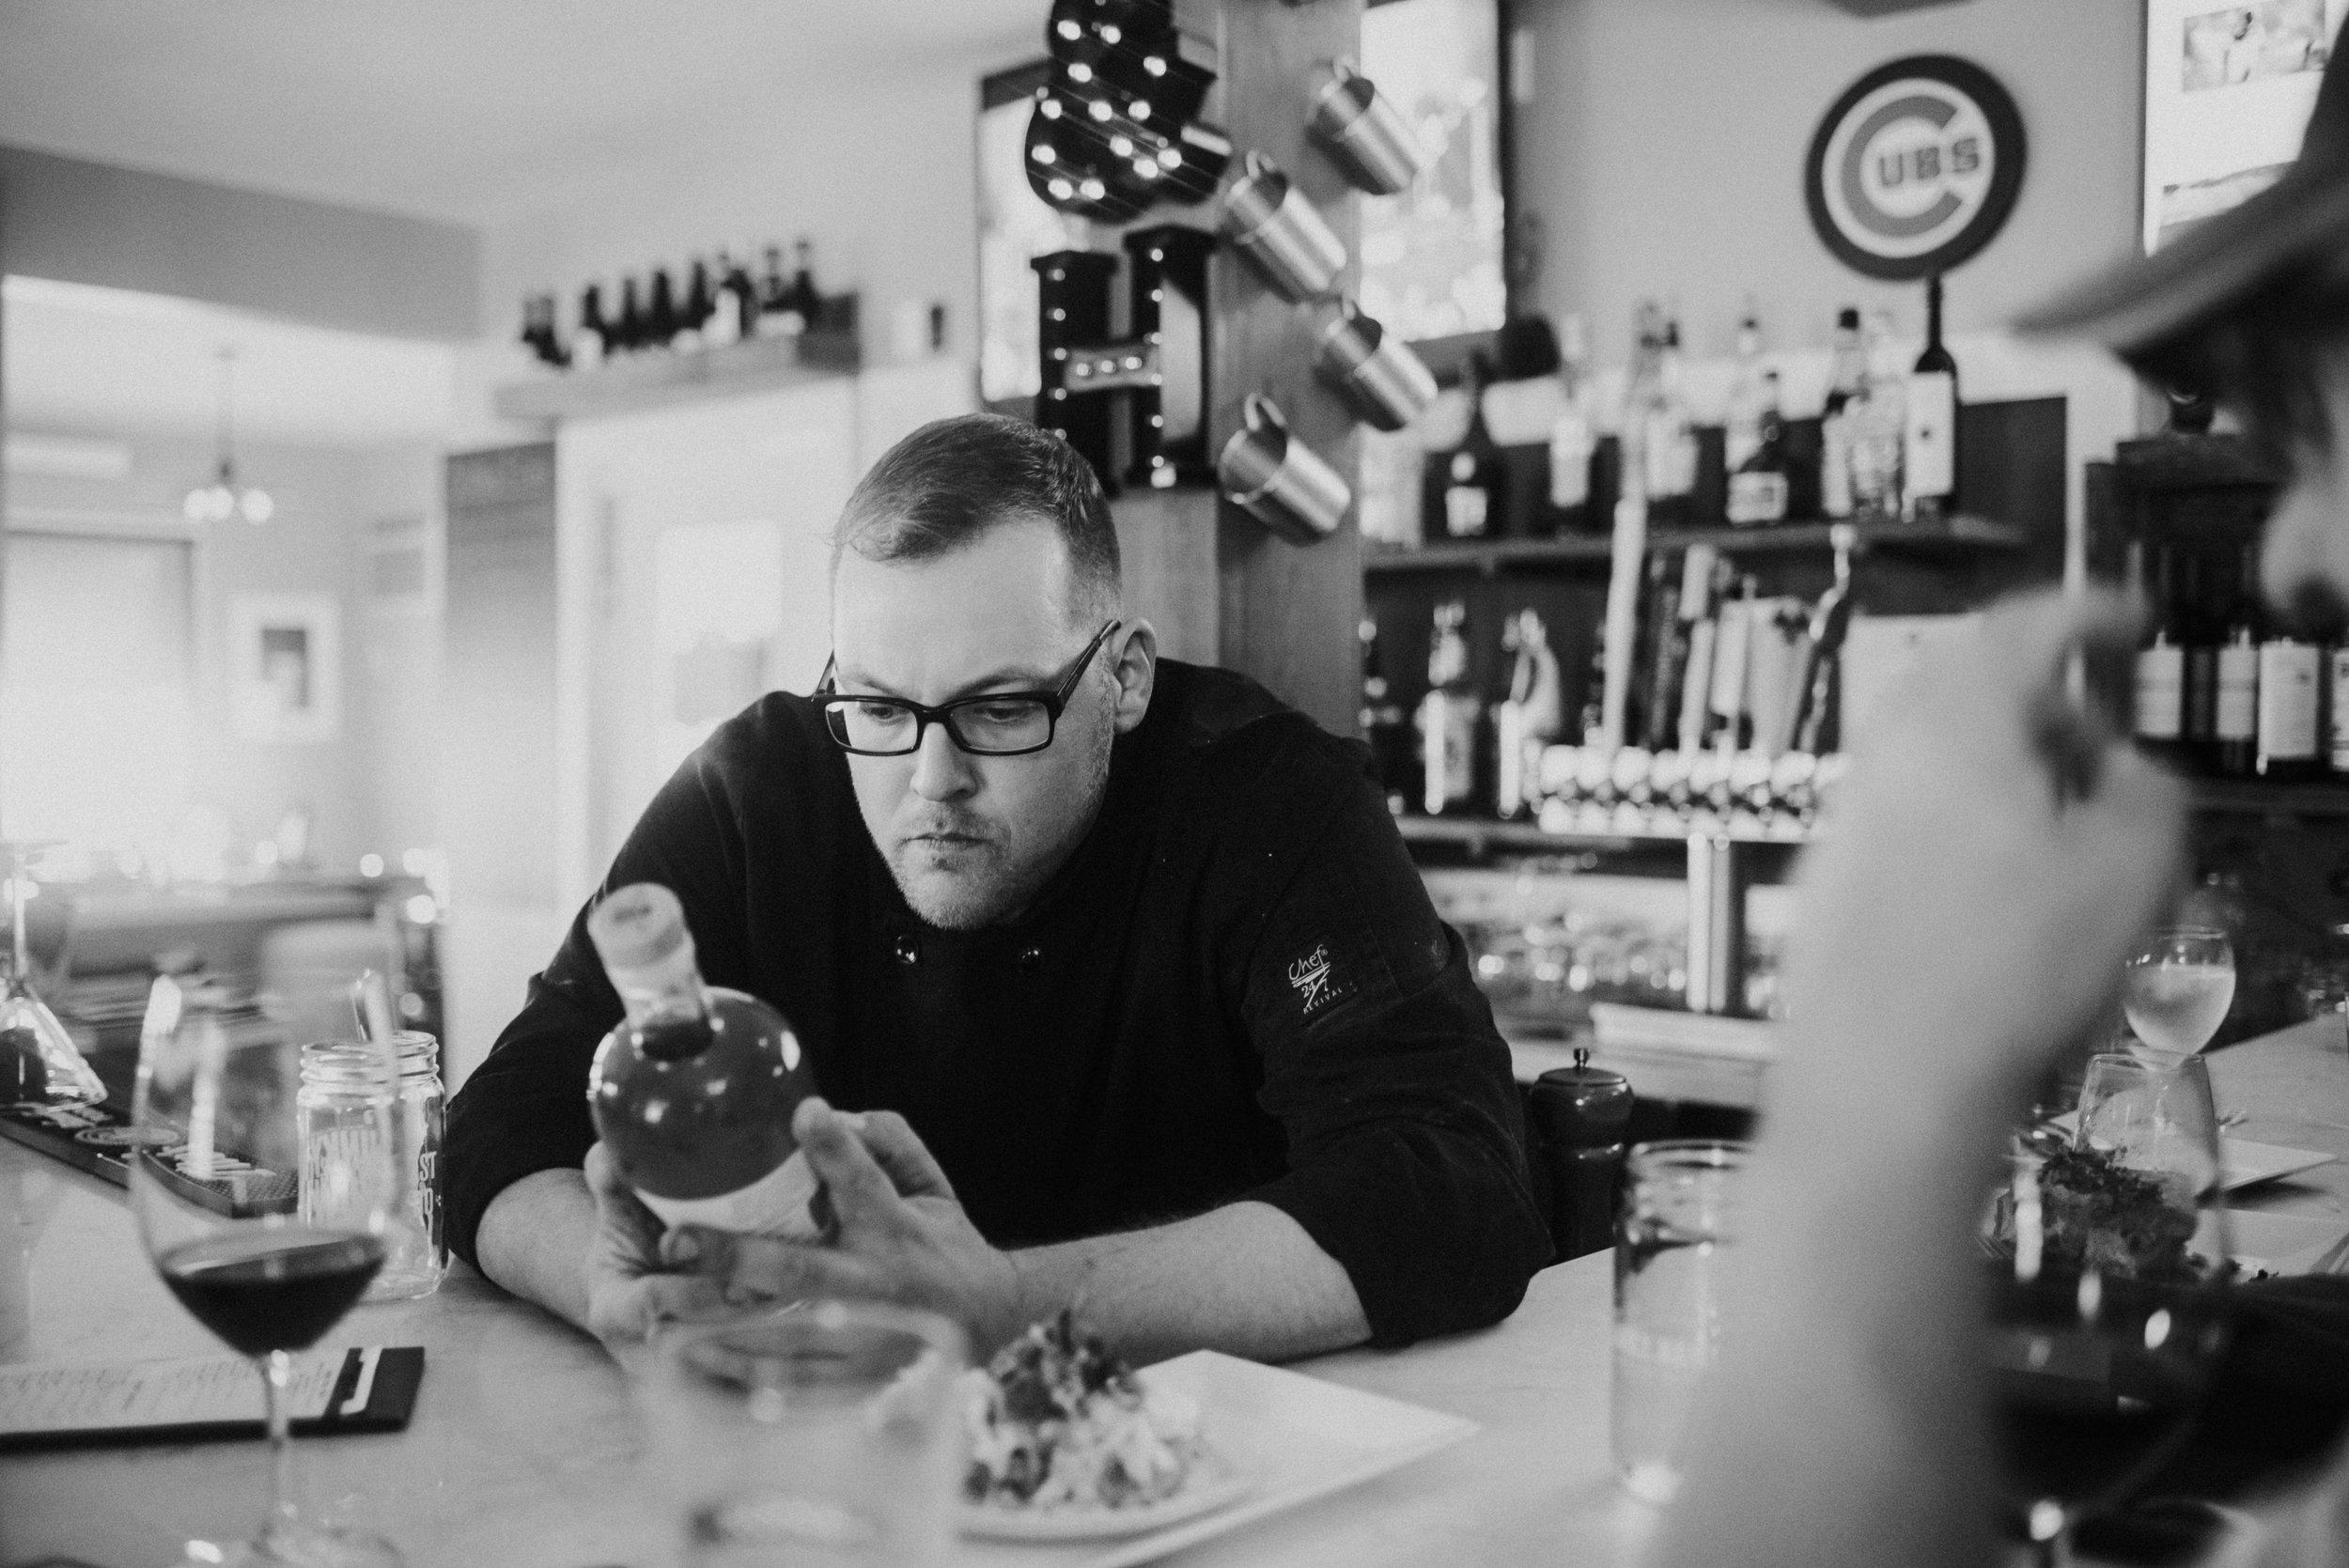 Chef Jackson Yordon at the Salt & Honey Restaurant's bar in Kennebunkport, Maine.